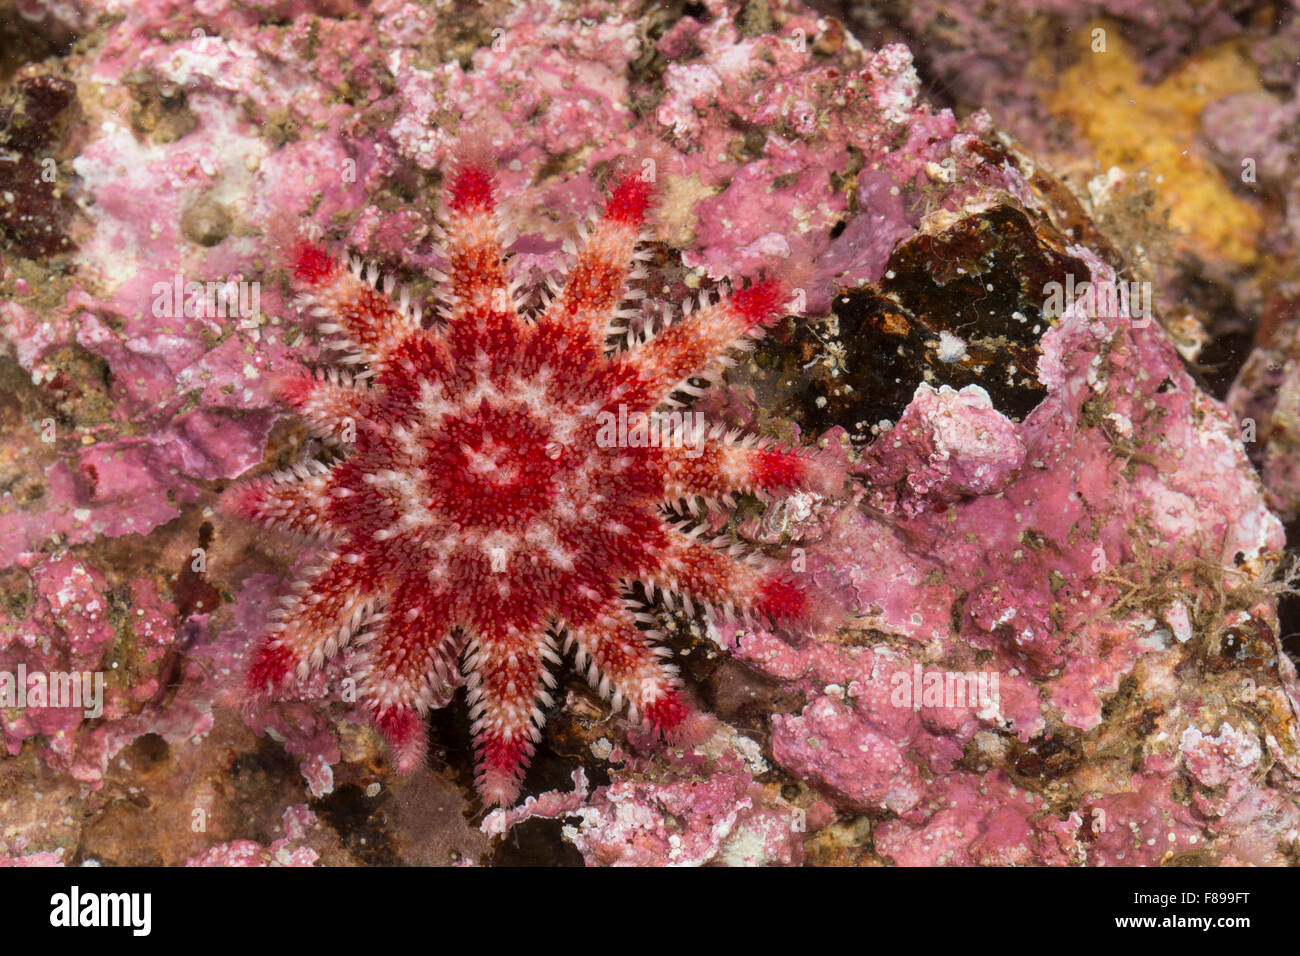 Common sun star, sunstar, spiny sun star, sea star, sea-star, Sonnenstern, Seesonne, Crossaster papposus, Solaster - Stock Image